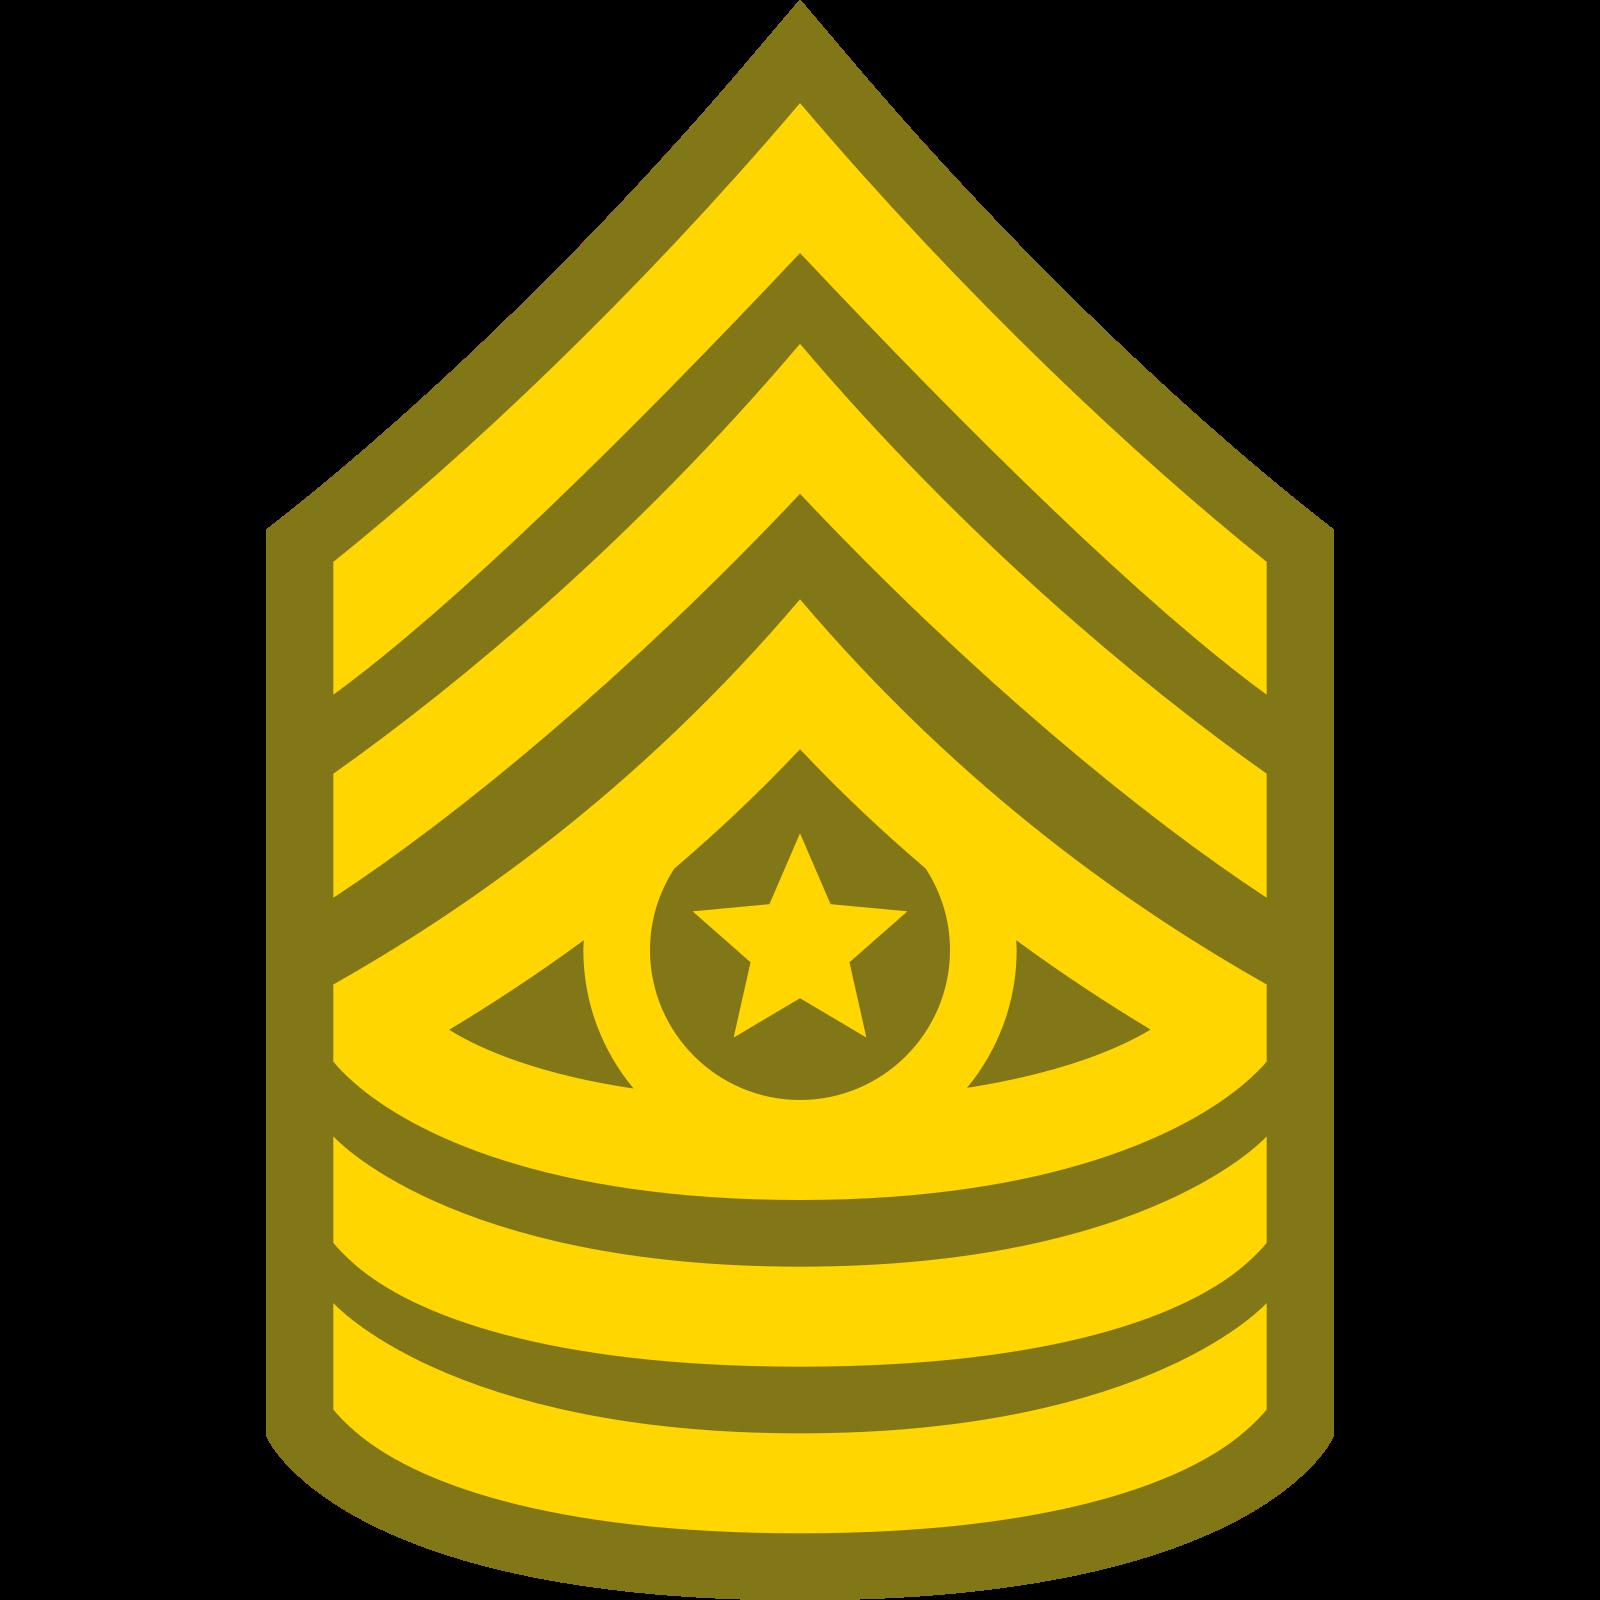 Starszy Sierżant Major CSM icon